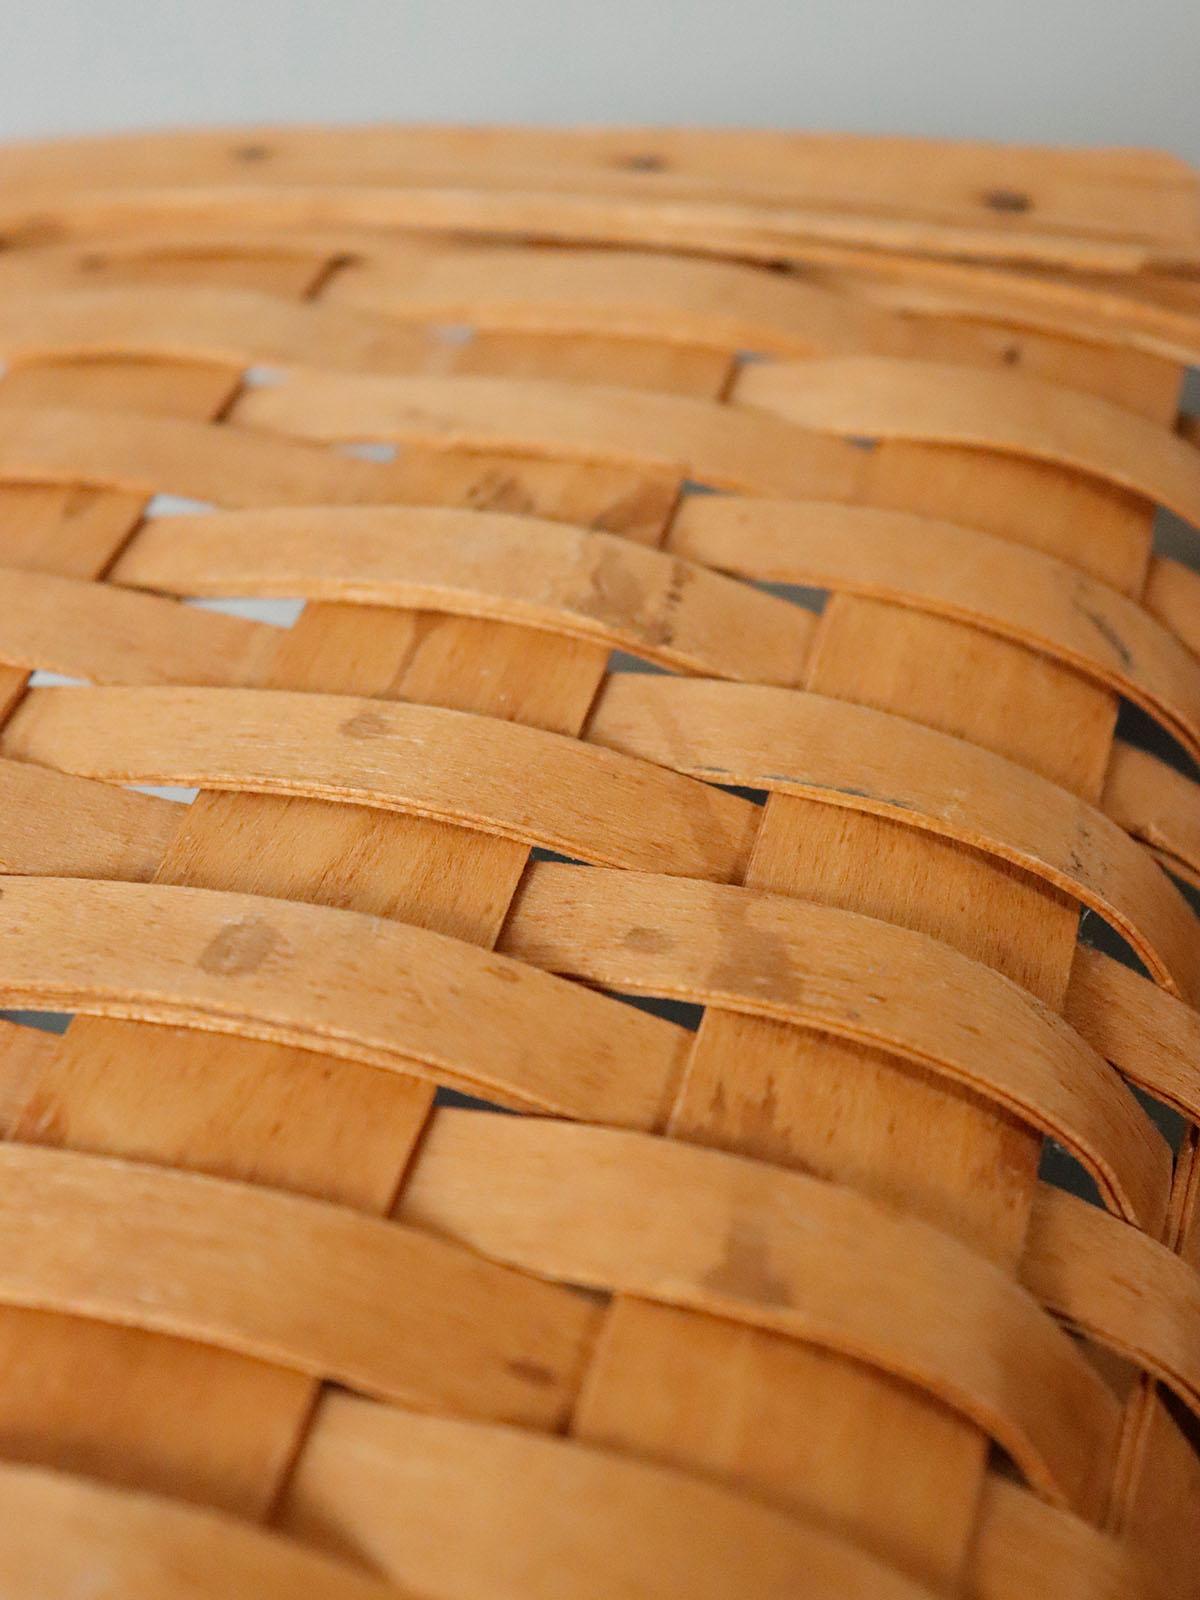 longaberger baskets company,USA,vintage,wood basket,handmade